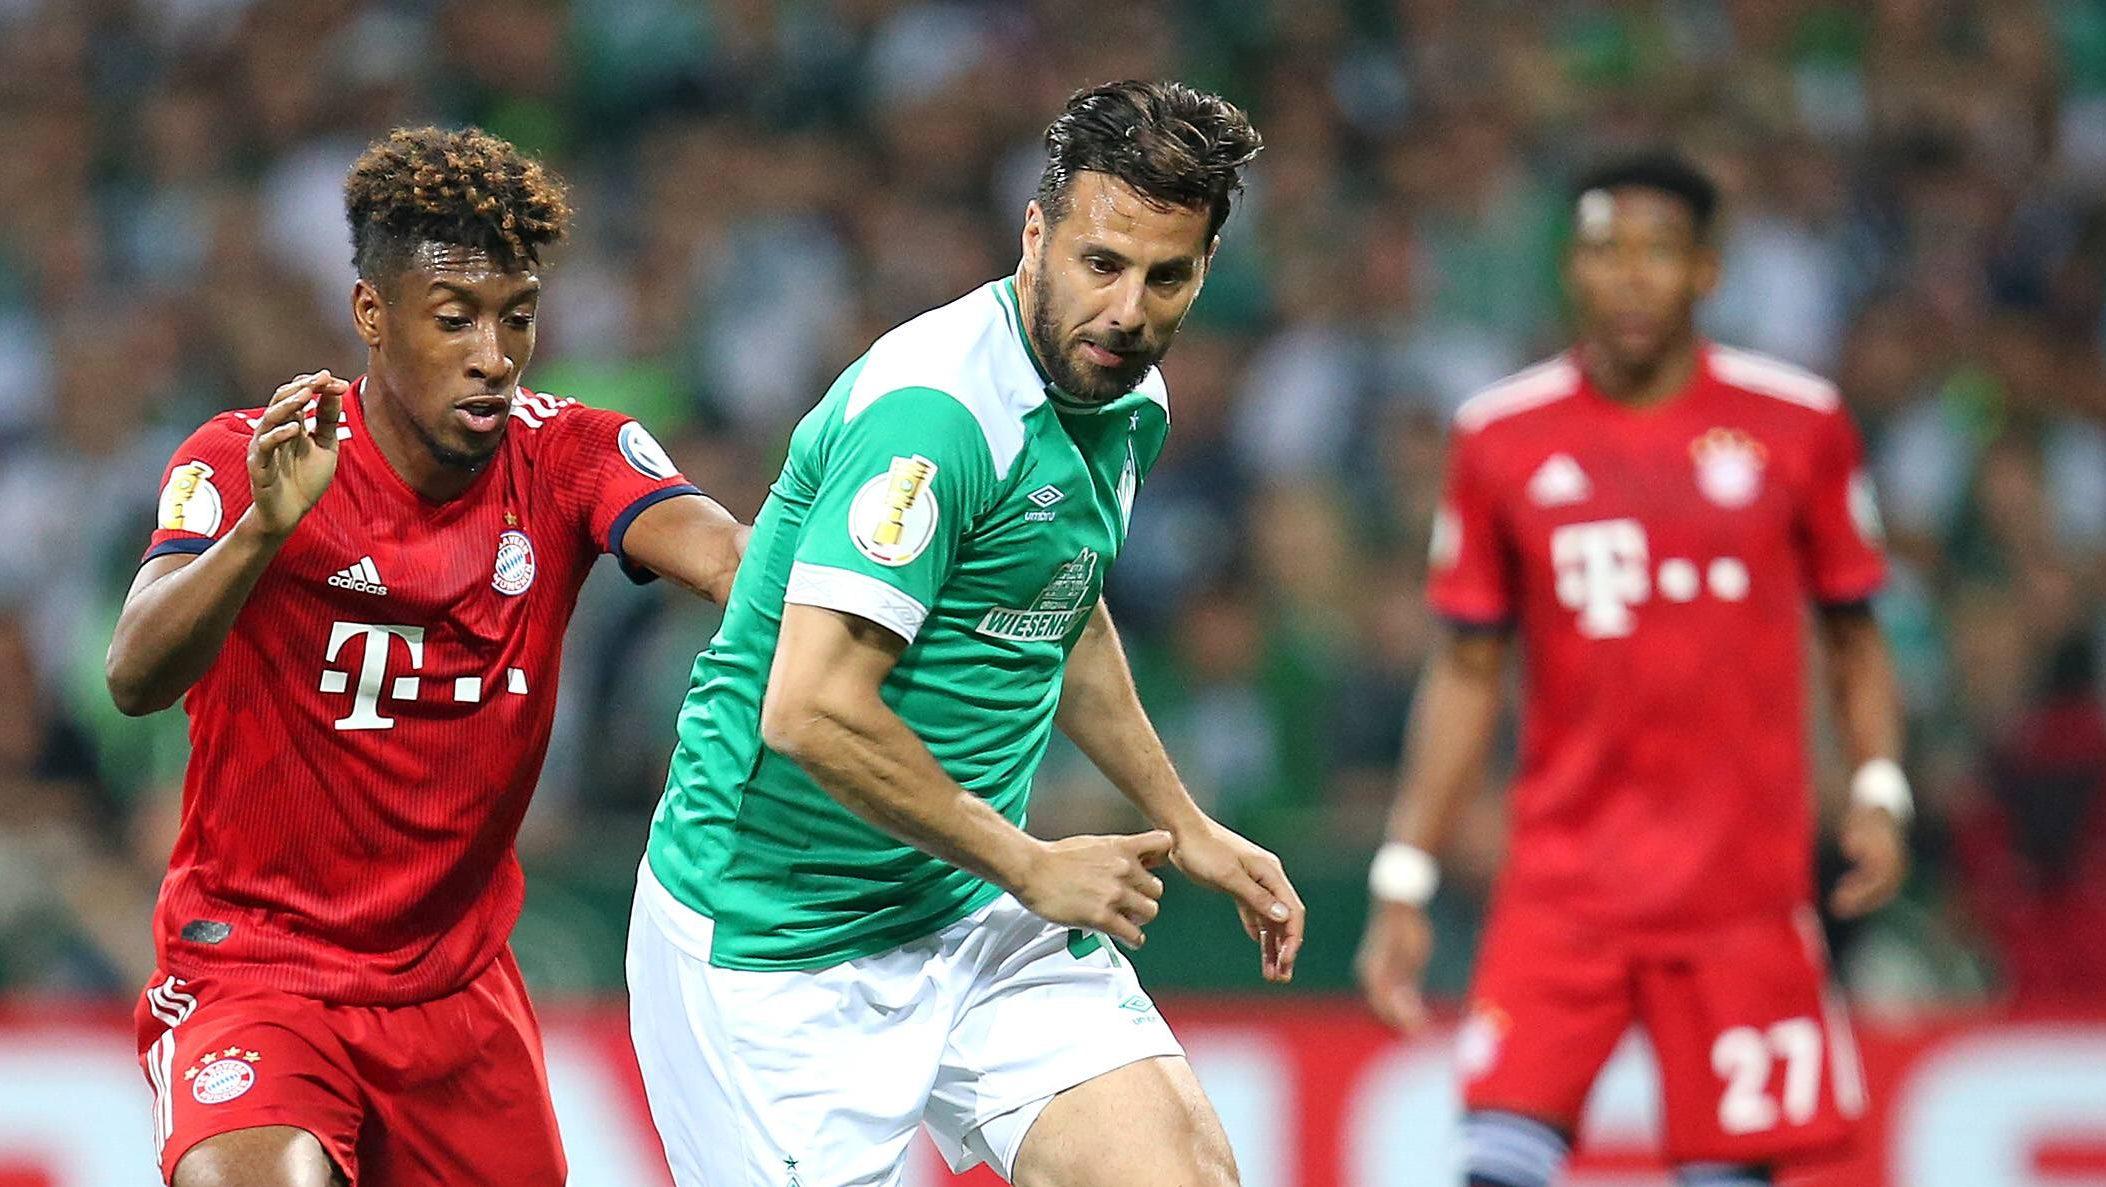 f66aaa00b Claudio Pizarro backs Kingsley Coman and Serge Gnabry to replace Arjen  Robben and Franck Ribery at Bayern Munich